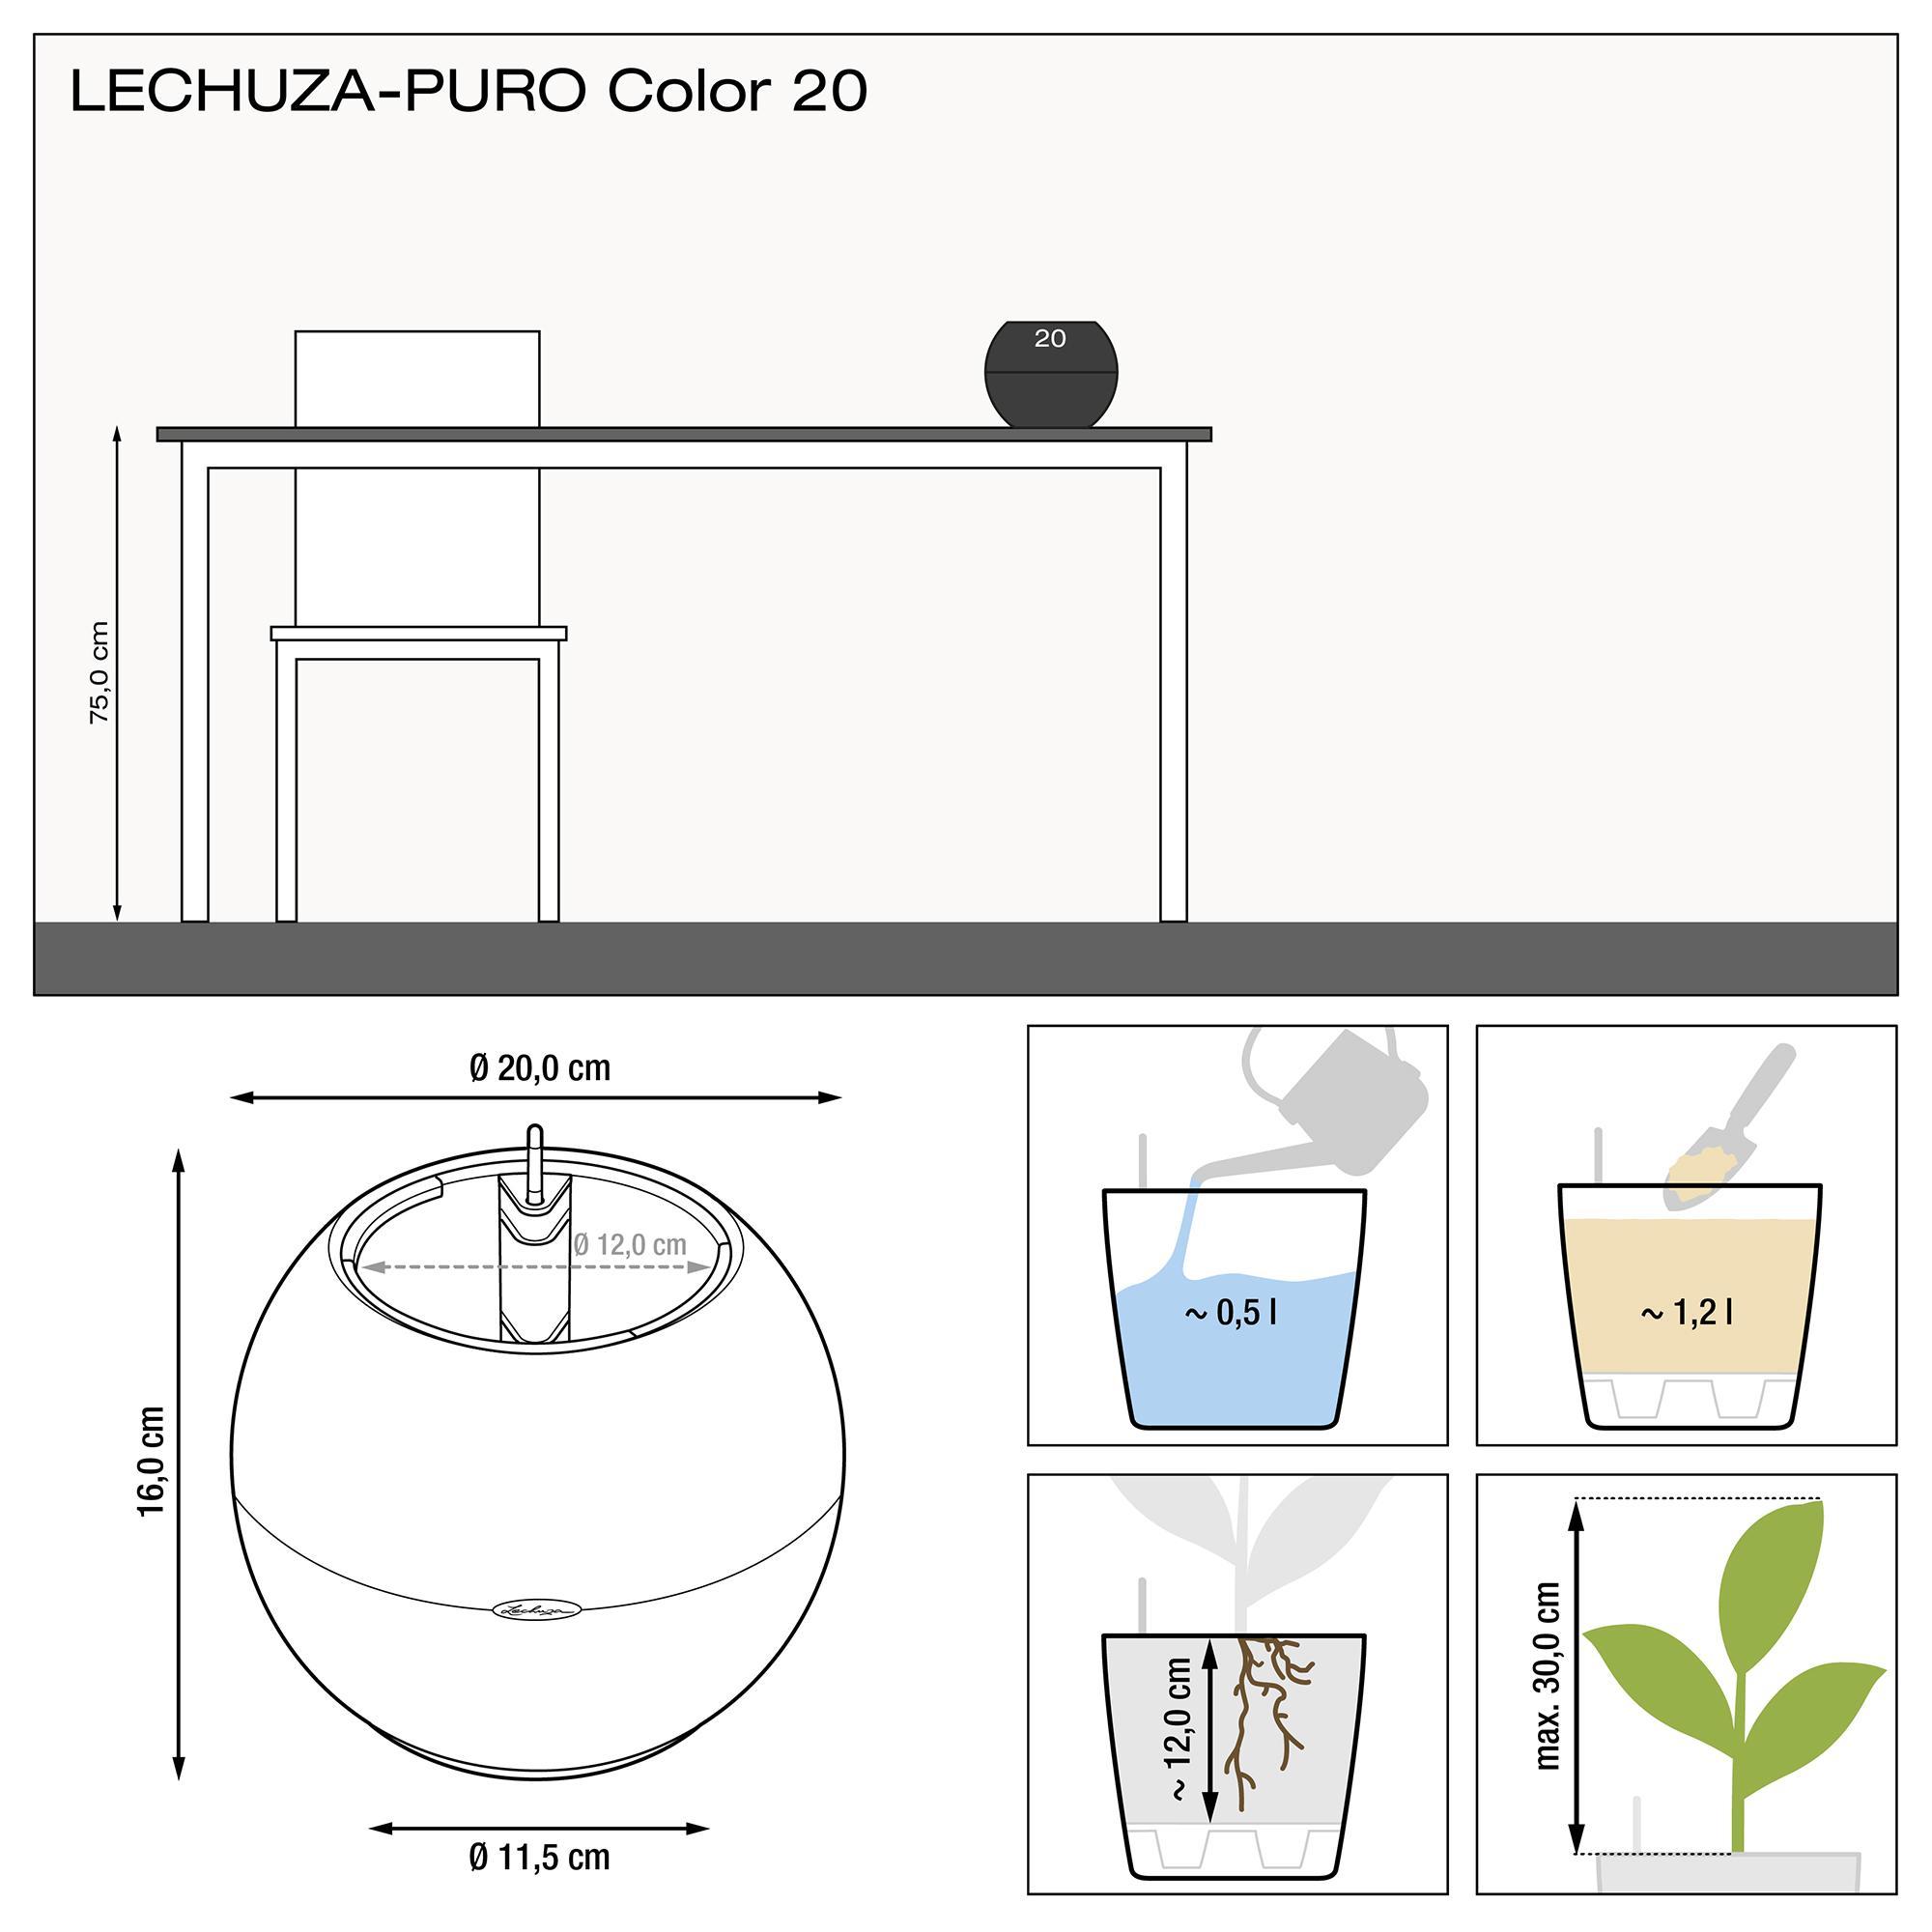 LECHUZA-PURO Color 20 weiß - Bild 3